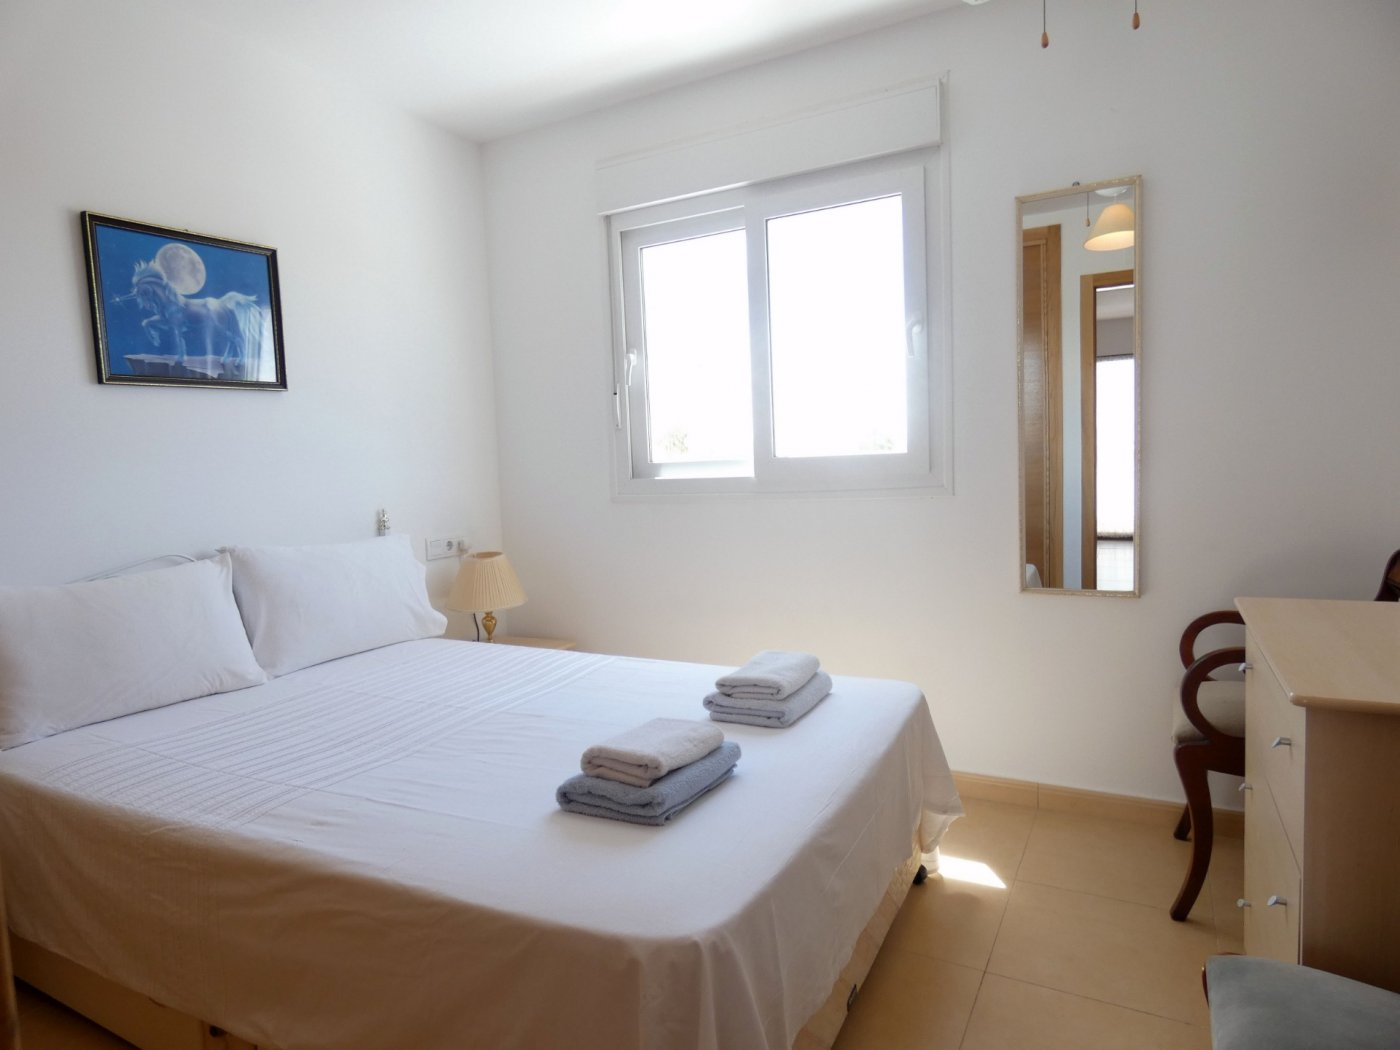 Gallery Image 6 of Key-Ready 2 Bedroom Apartment Overlooking the Citrus Groves in Jardin 10, Condado de Alhama